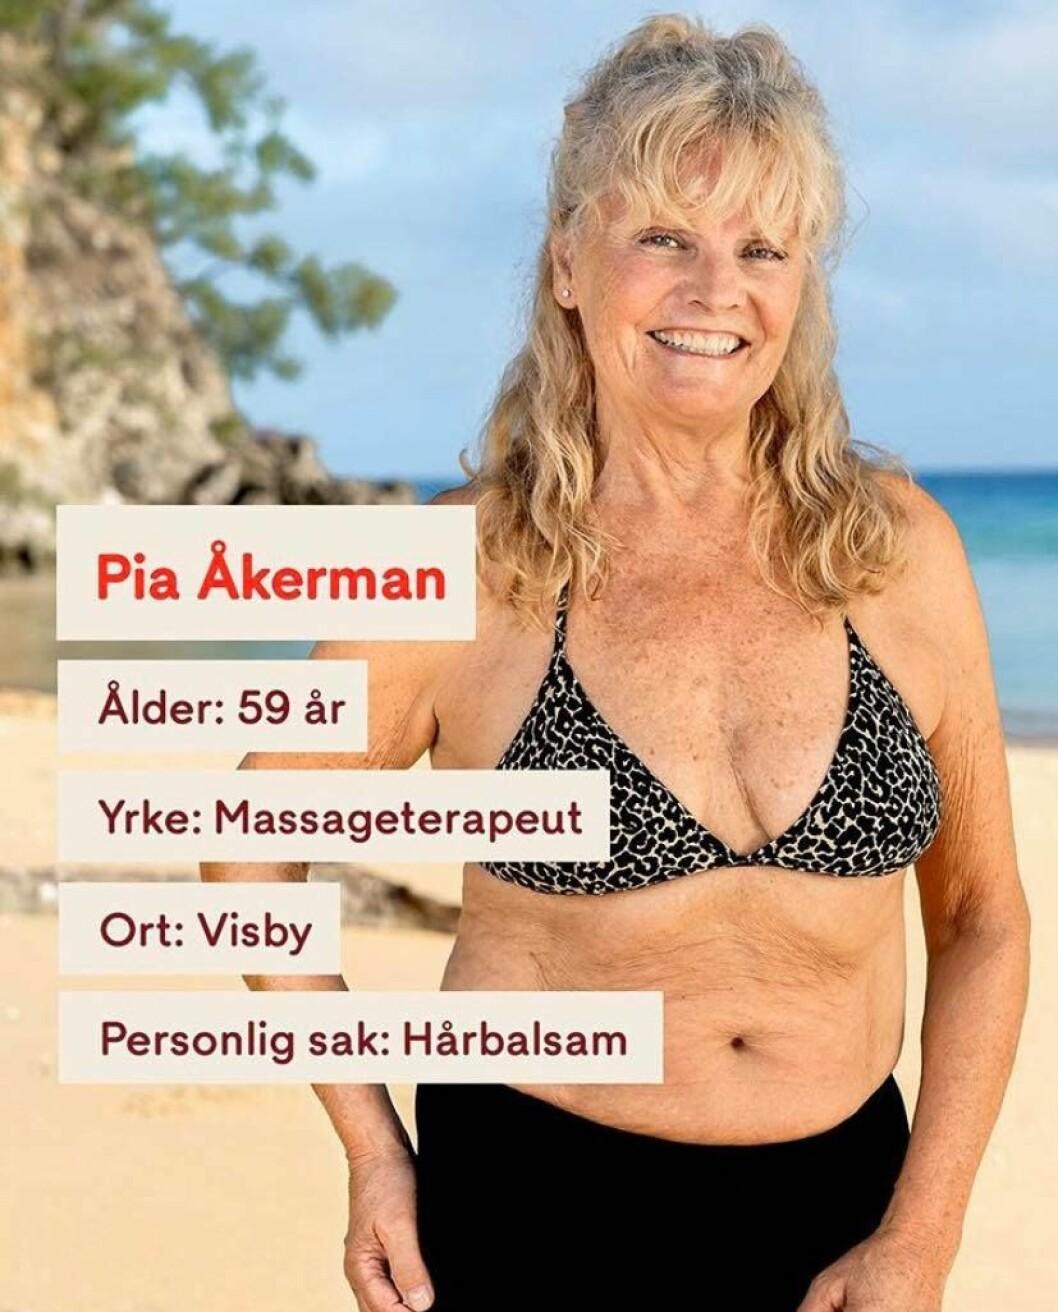 Pia Åkerman i Robinson 2020